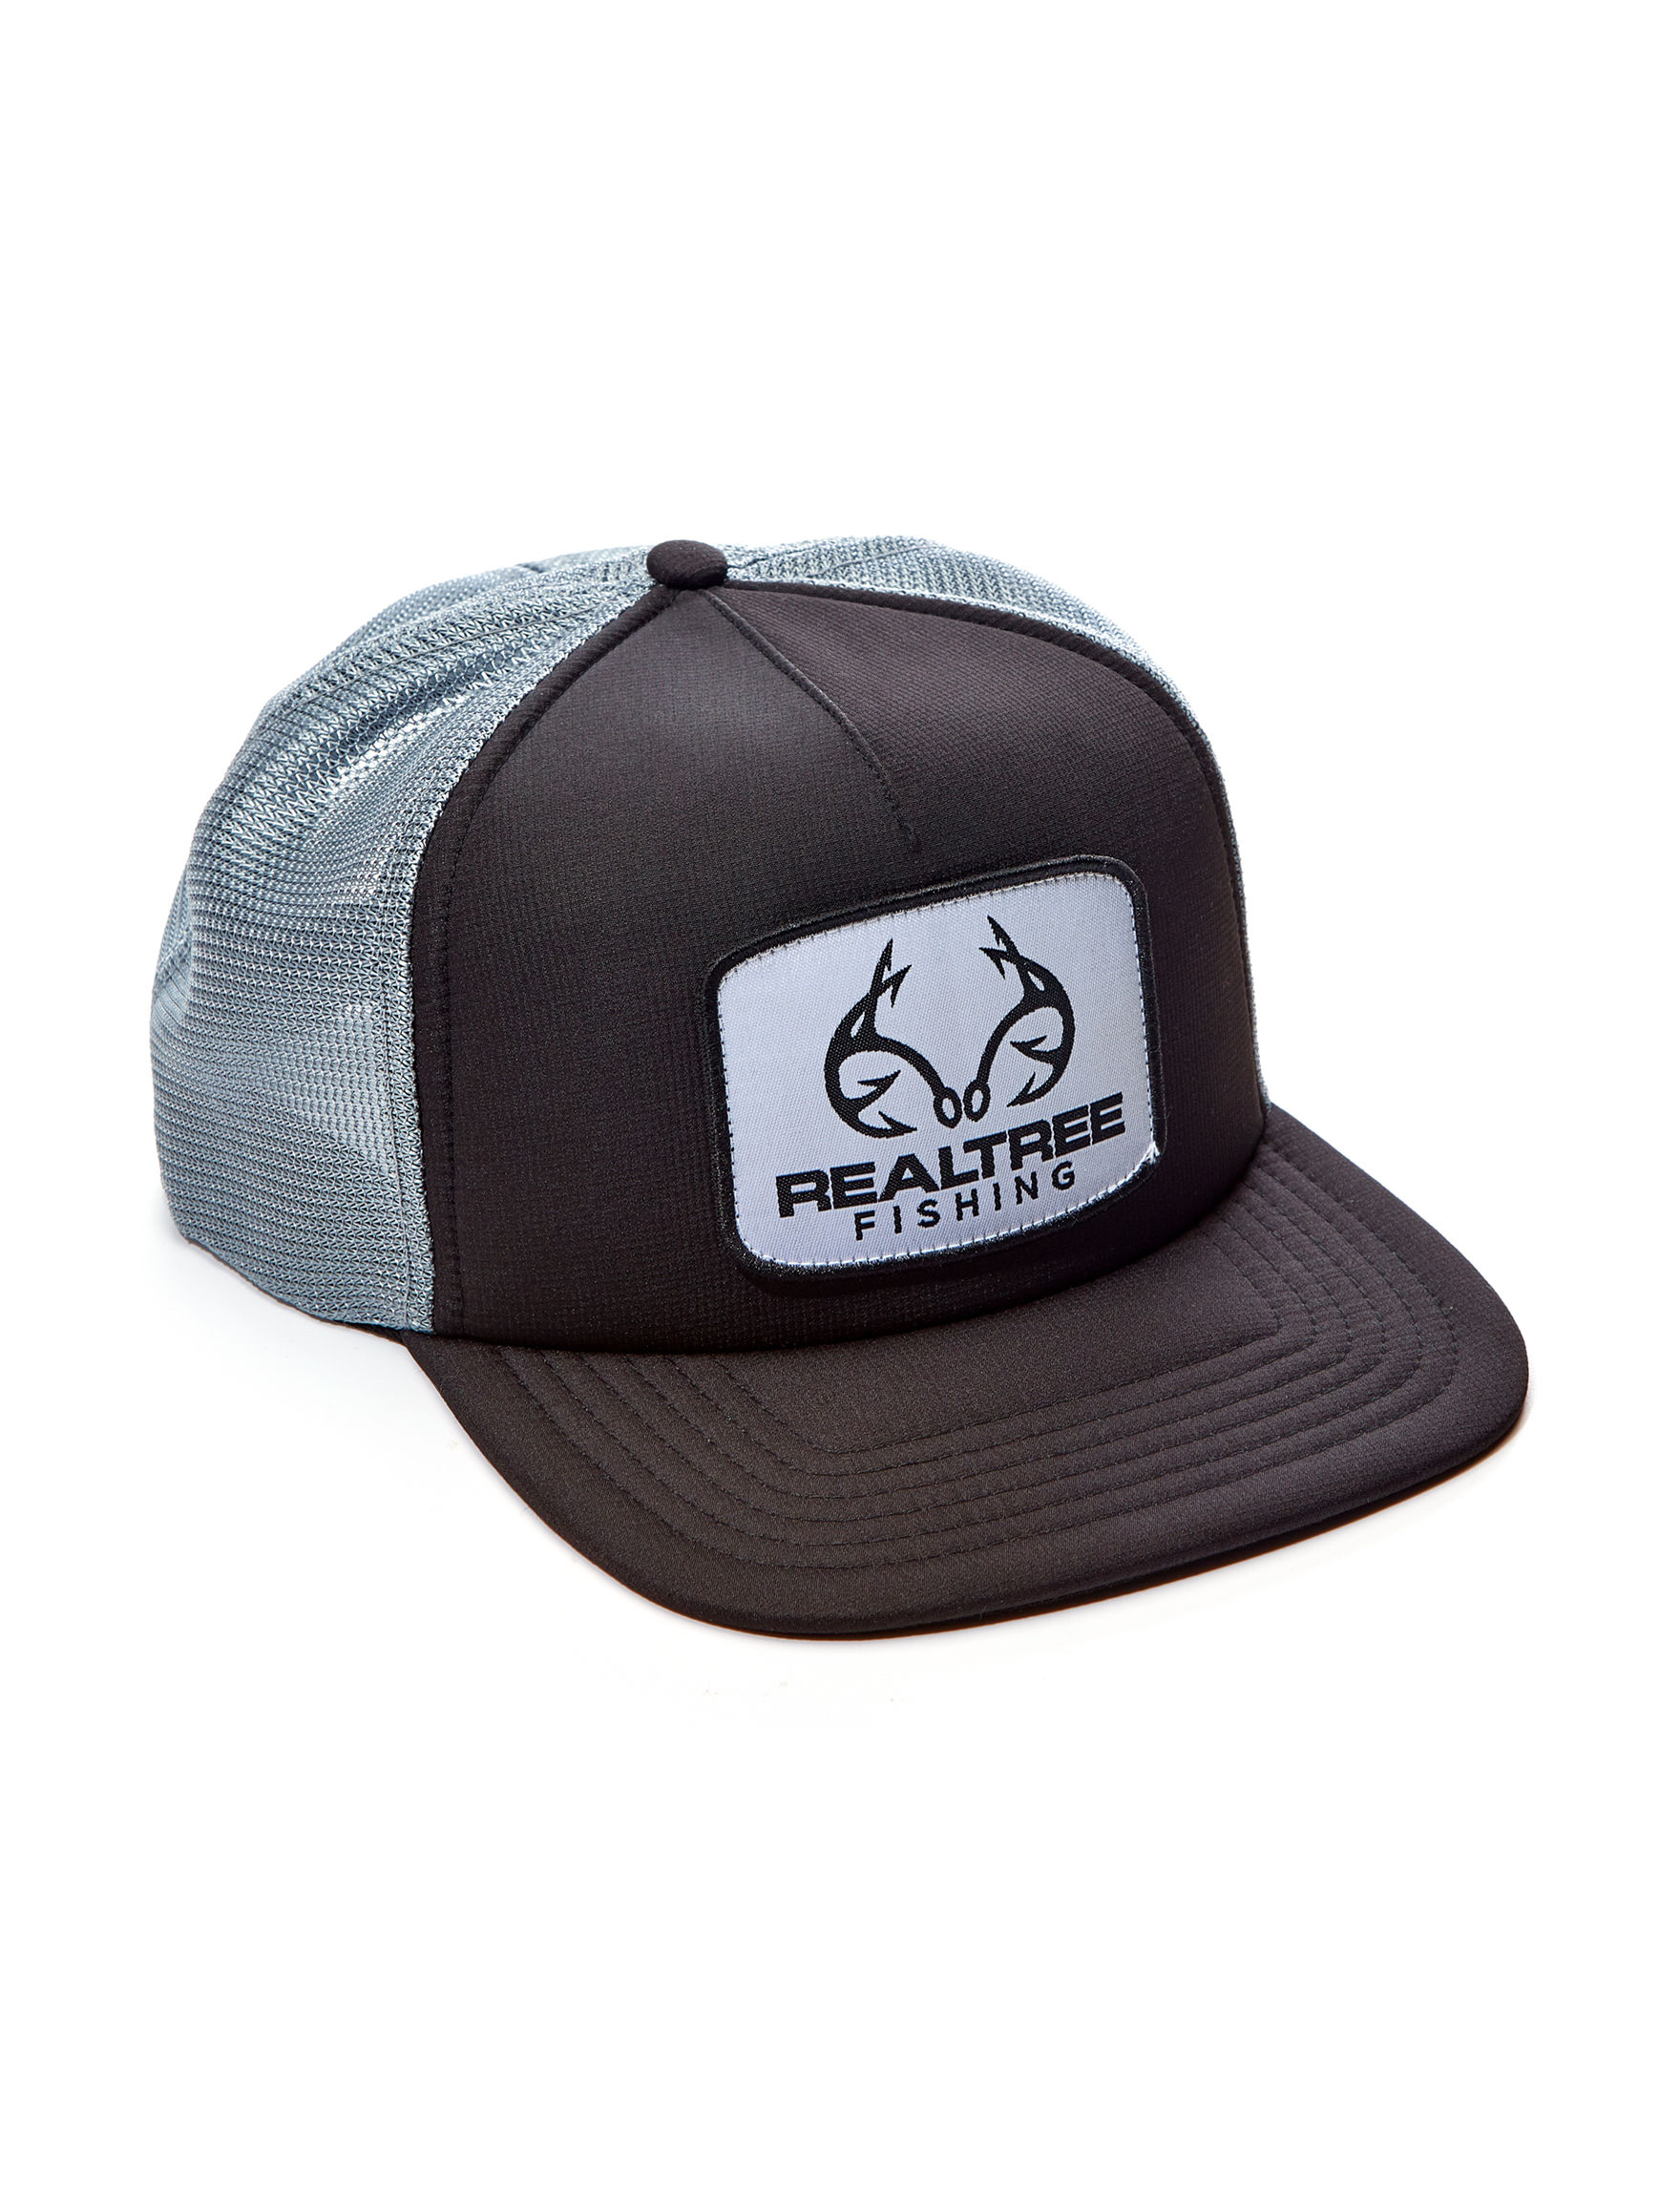 Realtree Black / Grey Hats & Headwear